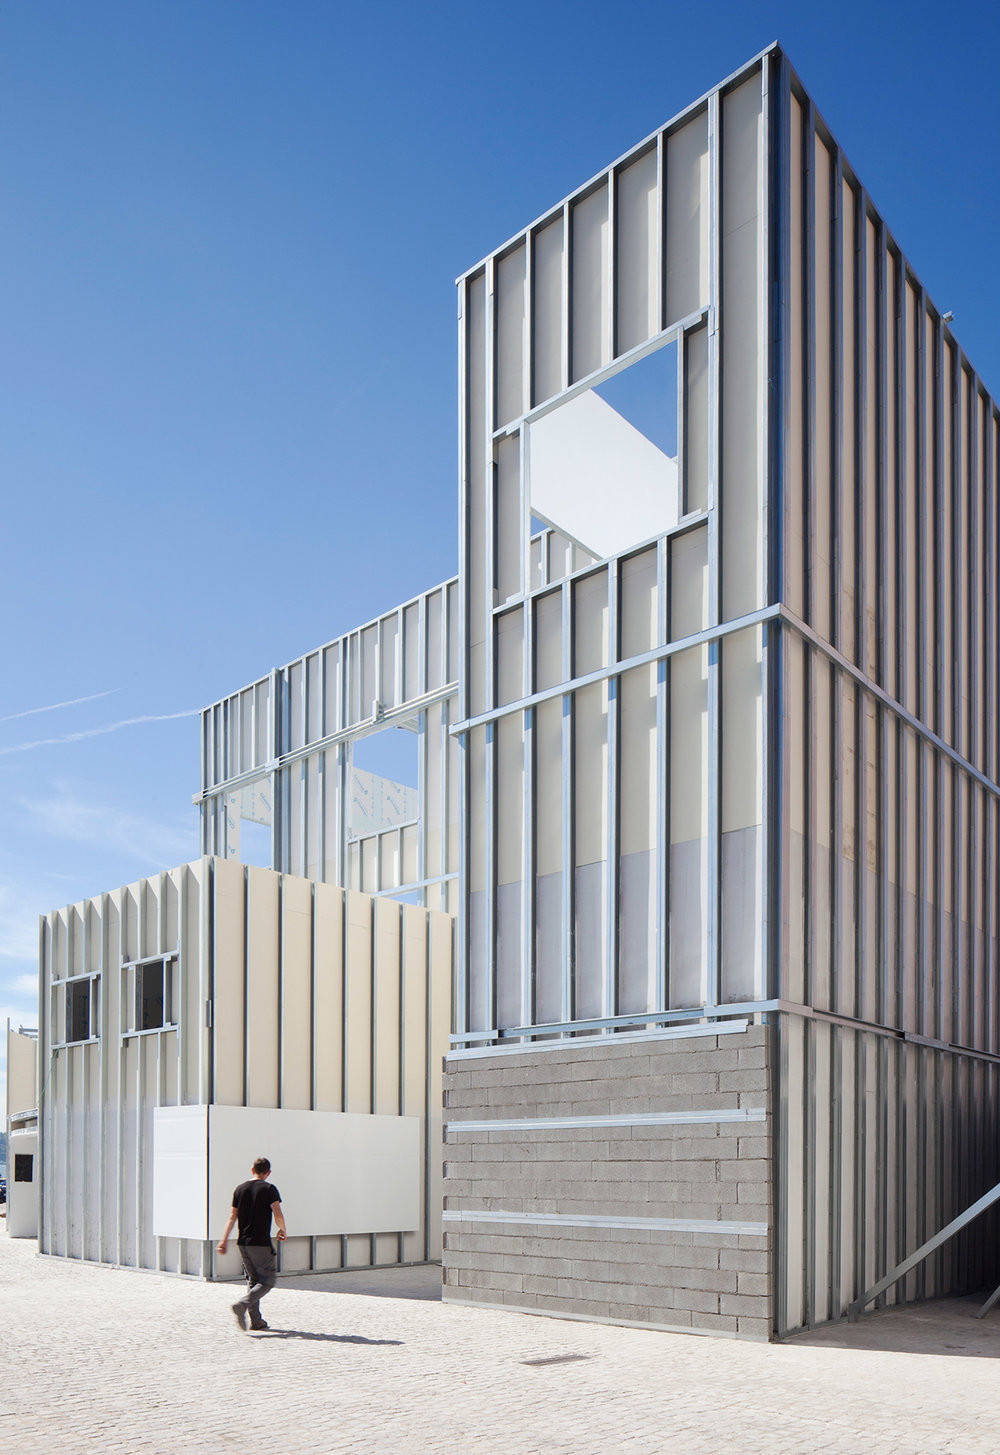 form-is-form-exhibition-architecture-lisbon-triennale-_dezeen_2364_col_5.jpg